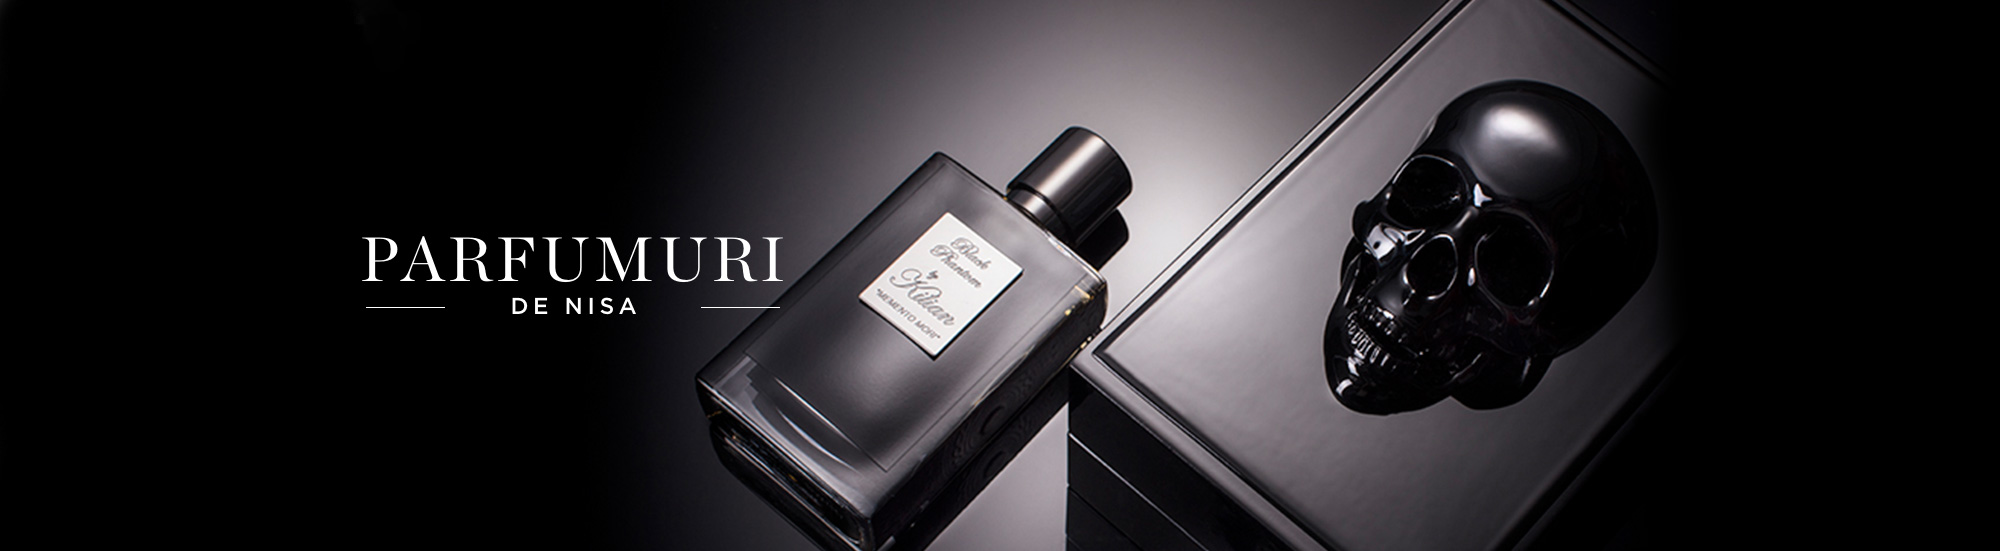 Parfumuri Nisa Parfumuri Bestvalue Duty Free Experience